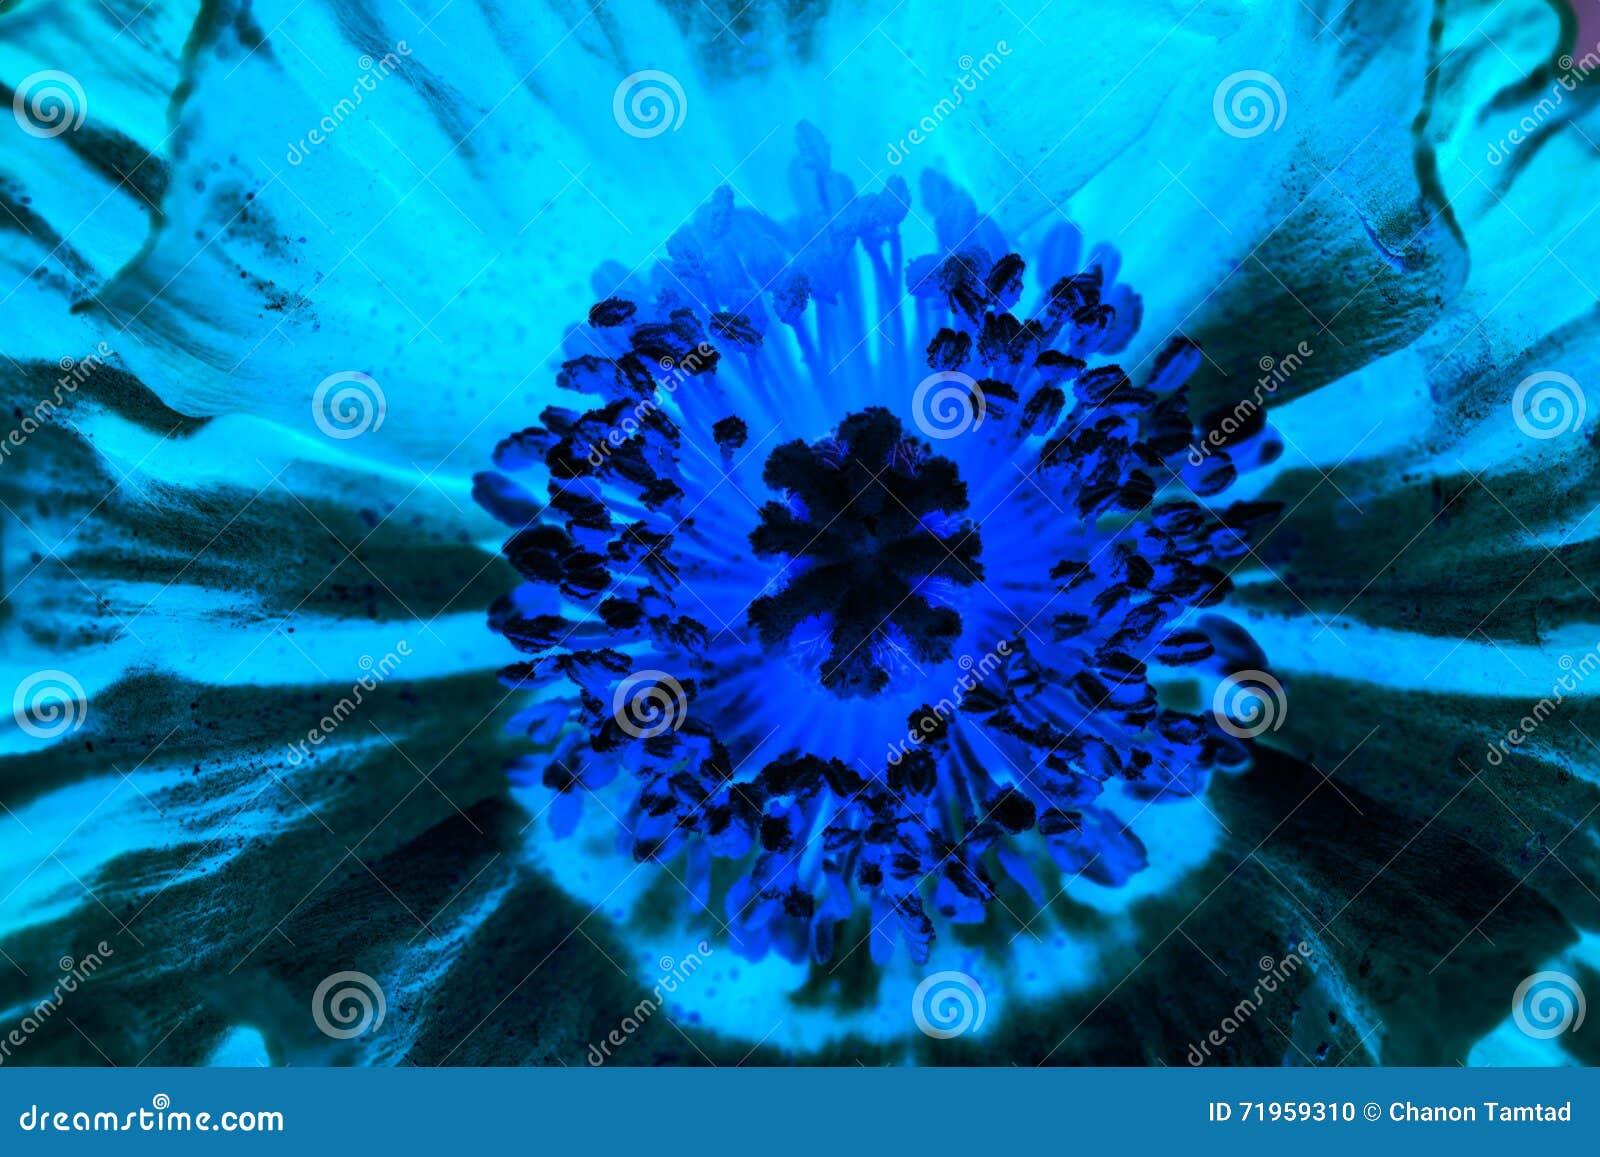 Close up of a iceland poppy flowerscientific name papaver nudic download close up of a iceland poppy flowerscientific name papaver nudic stock photo mightylinksfo